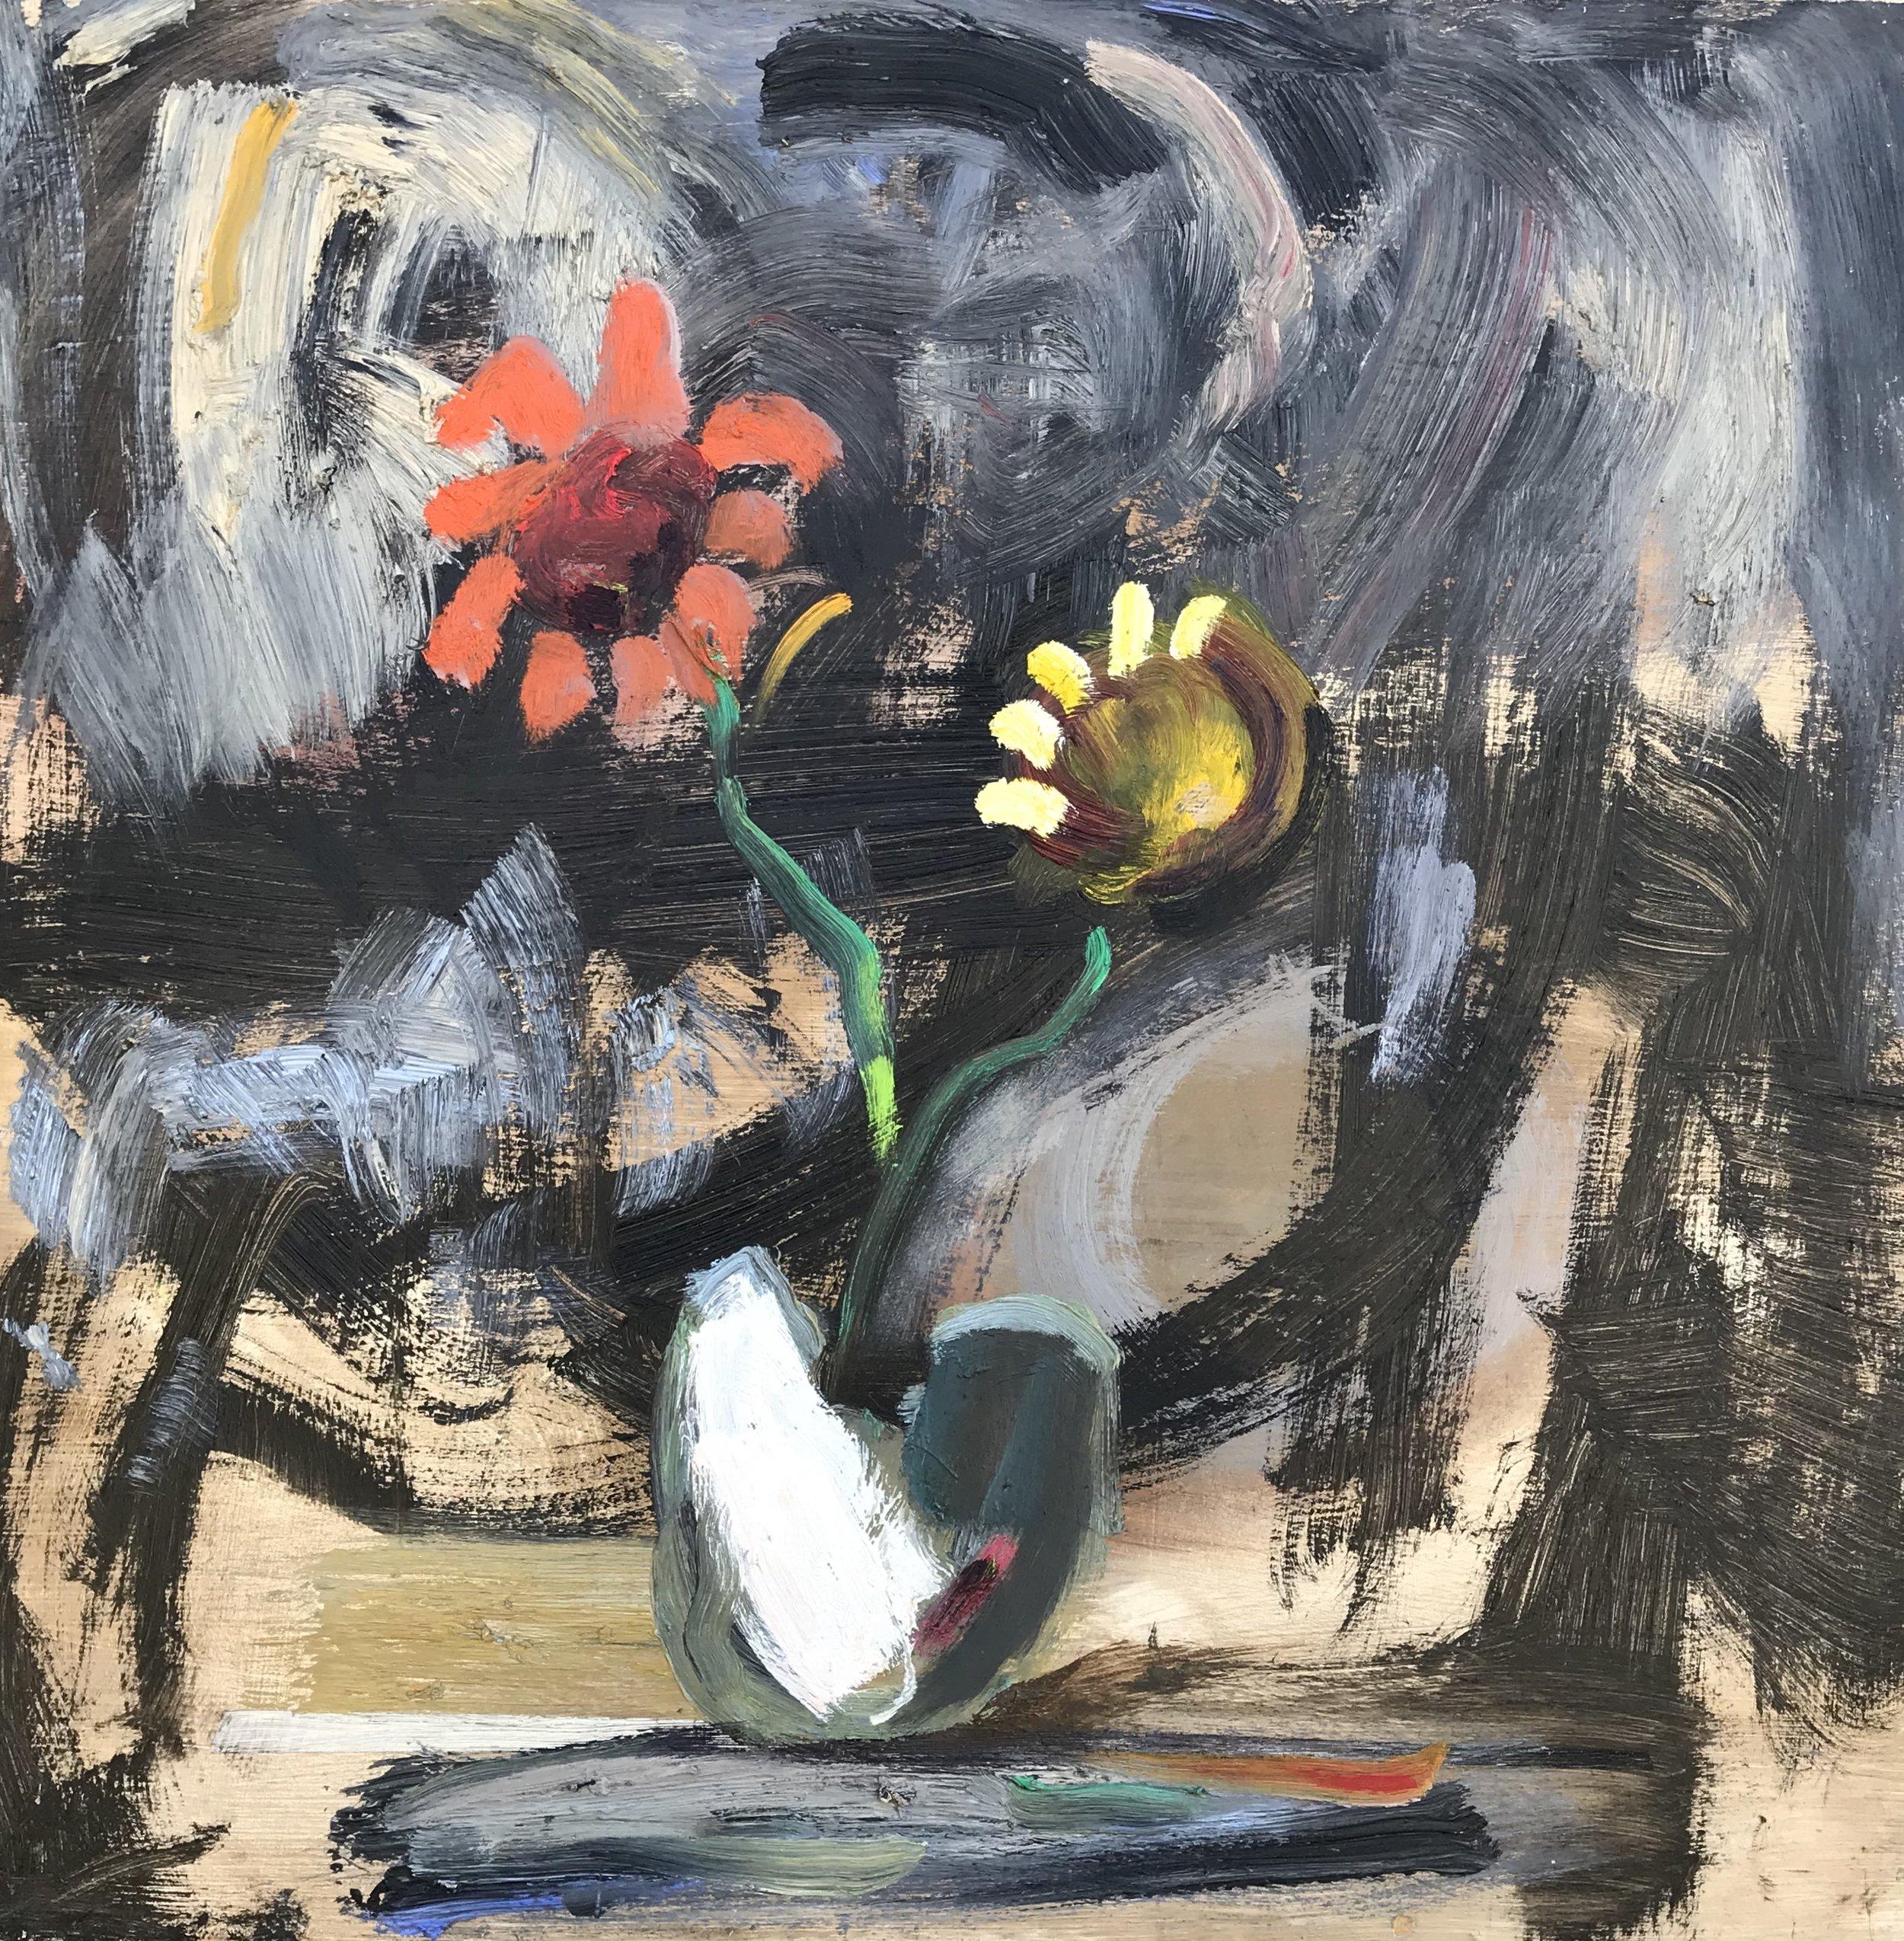 """Martini Haze"" - 24"" x 24"" x 3 3/4"", oil on panelValue: $2,650Opening bid: $1,050email your bid to: art@bradfordbrenner.com"